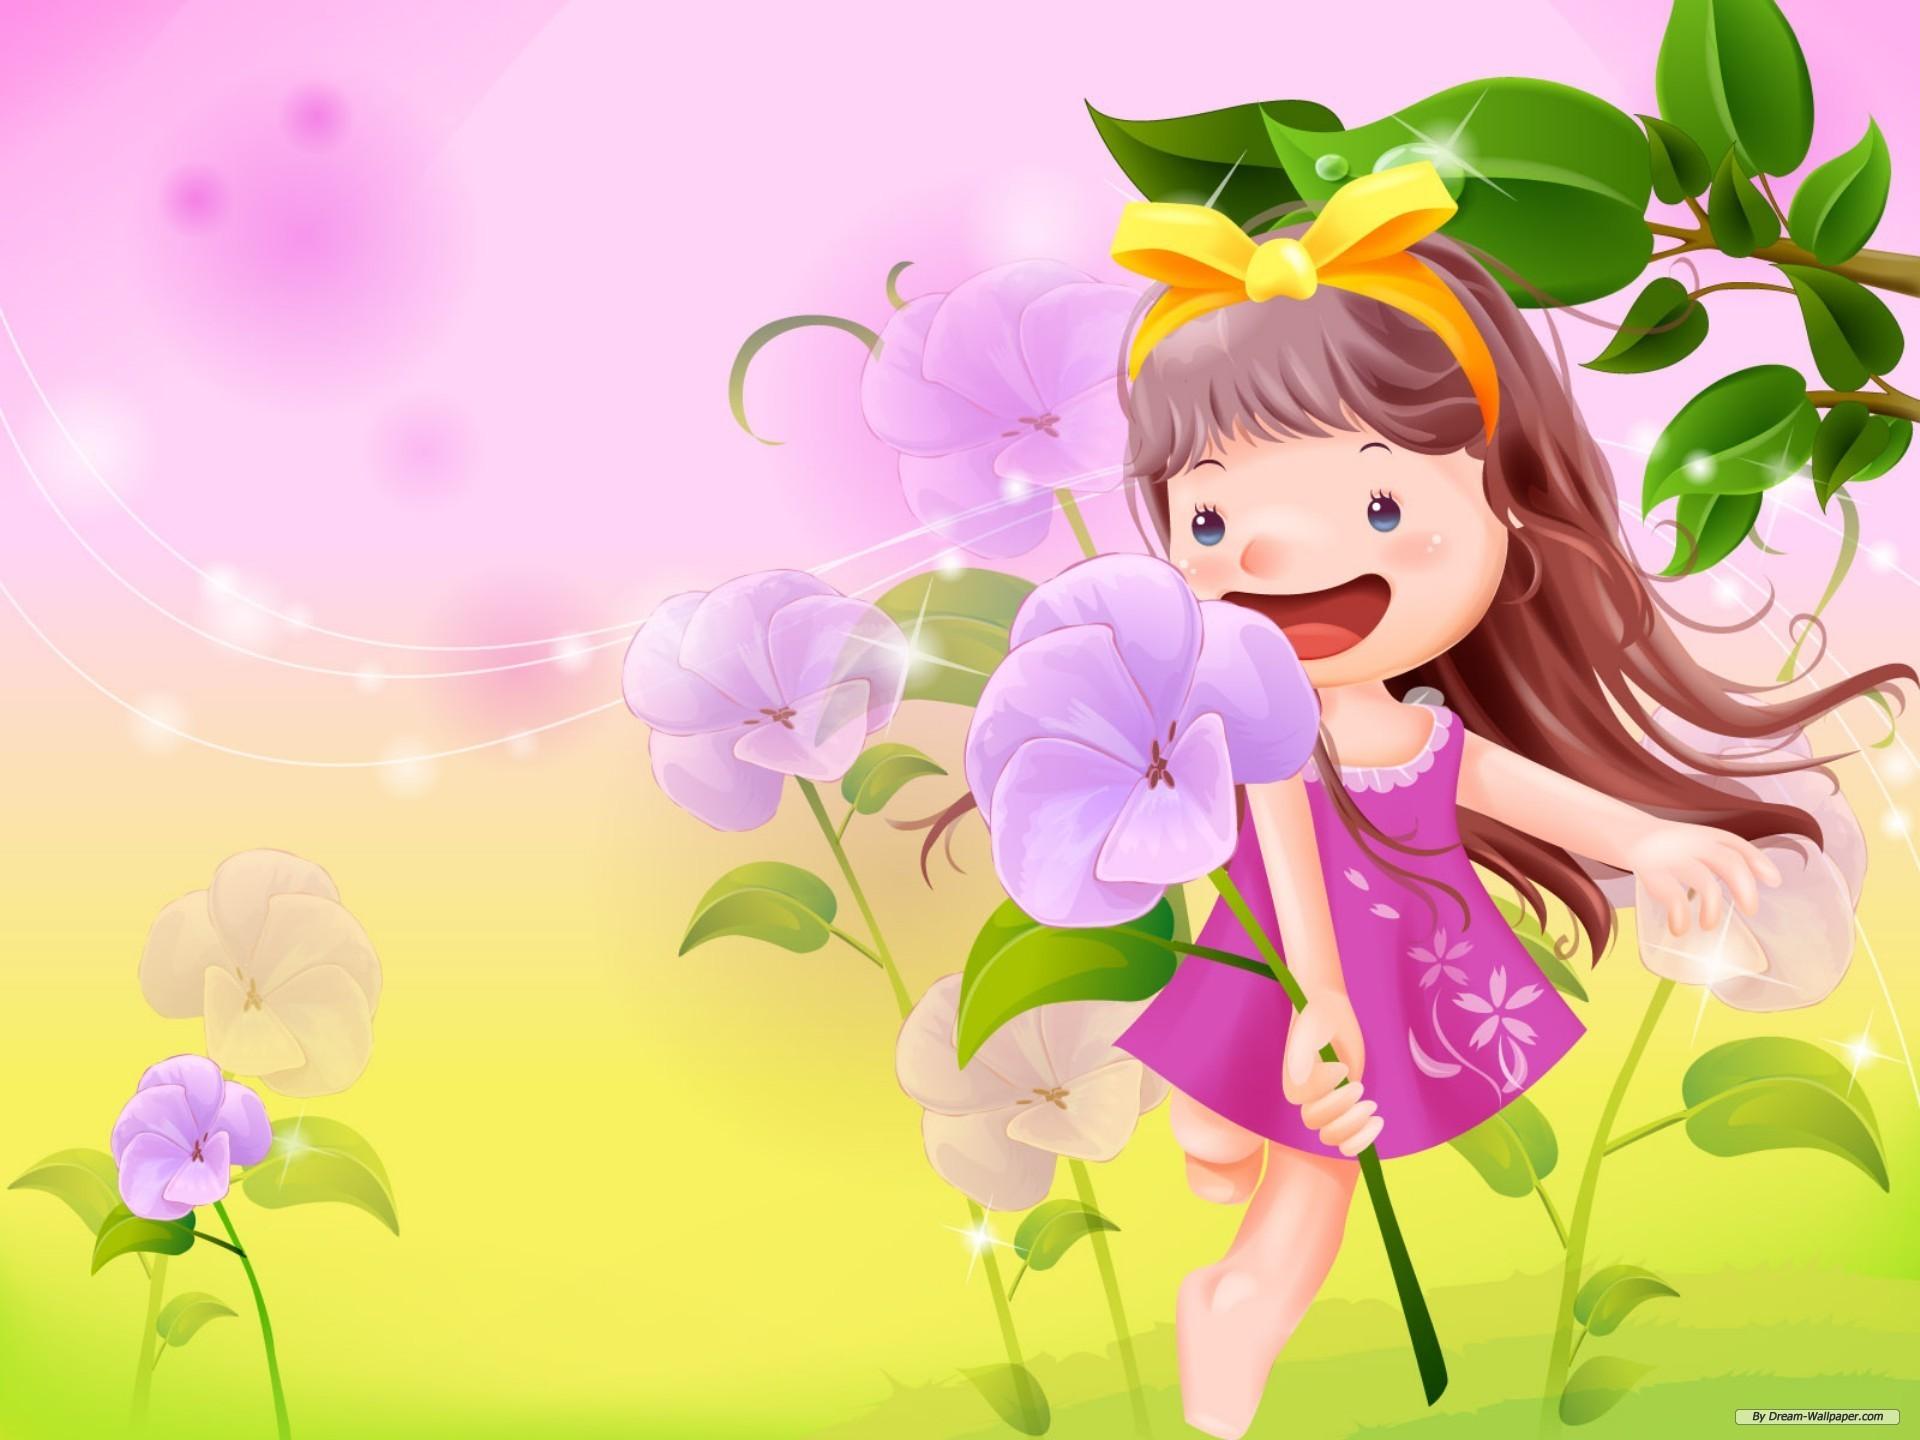 Cartoon Animated Wallpapers – bestscreenwallpaper.com – little girl